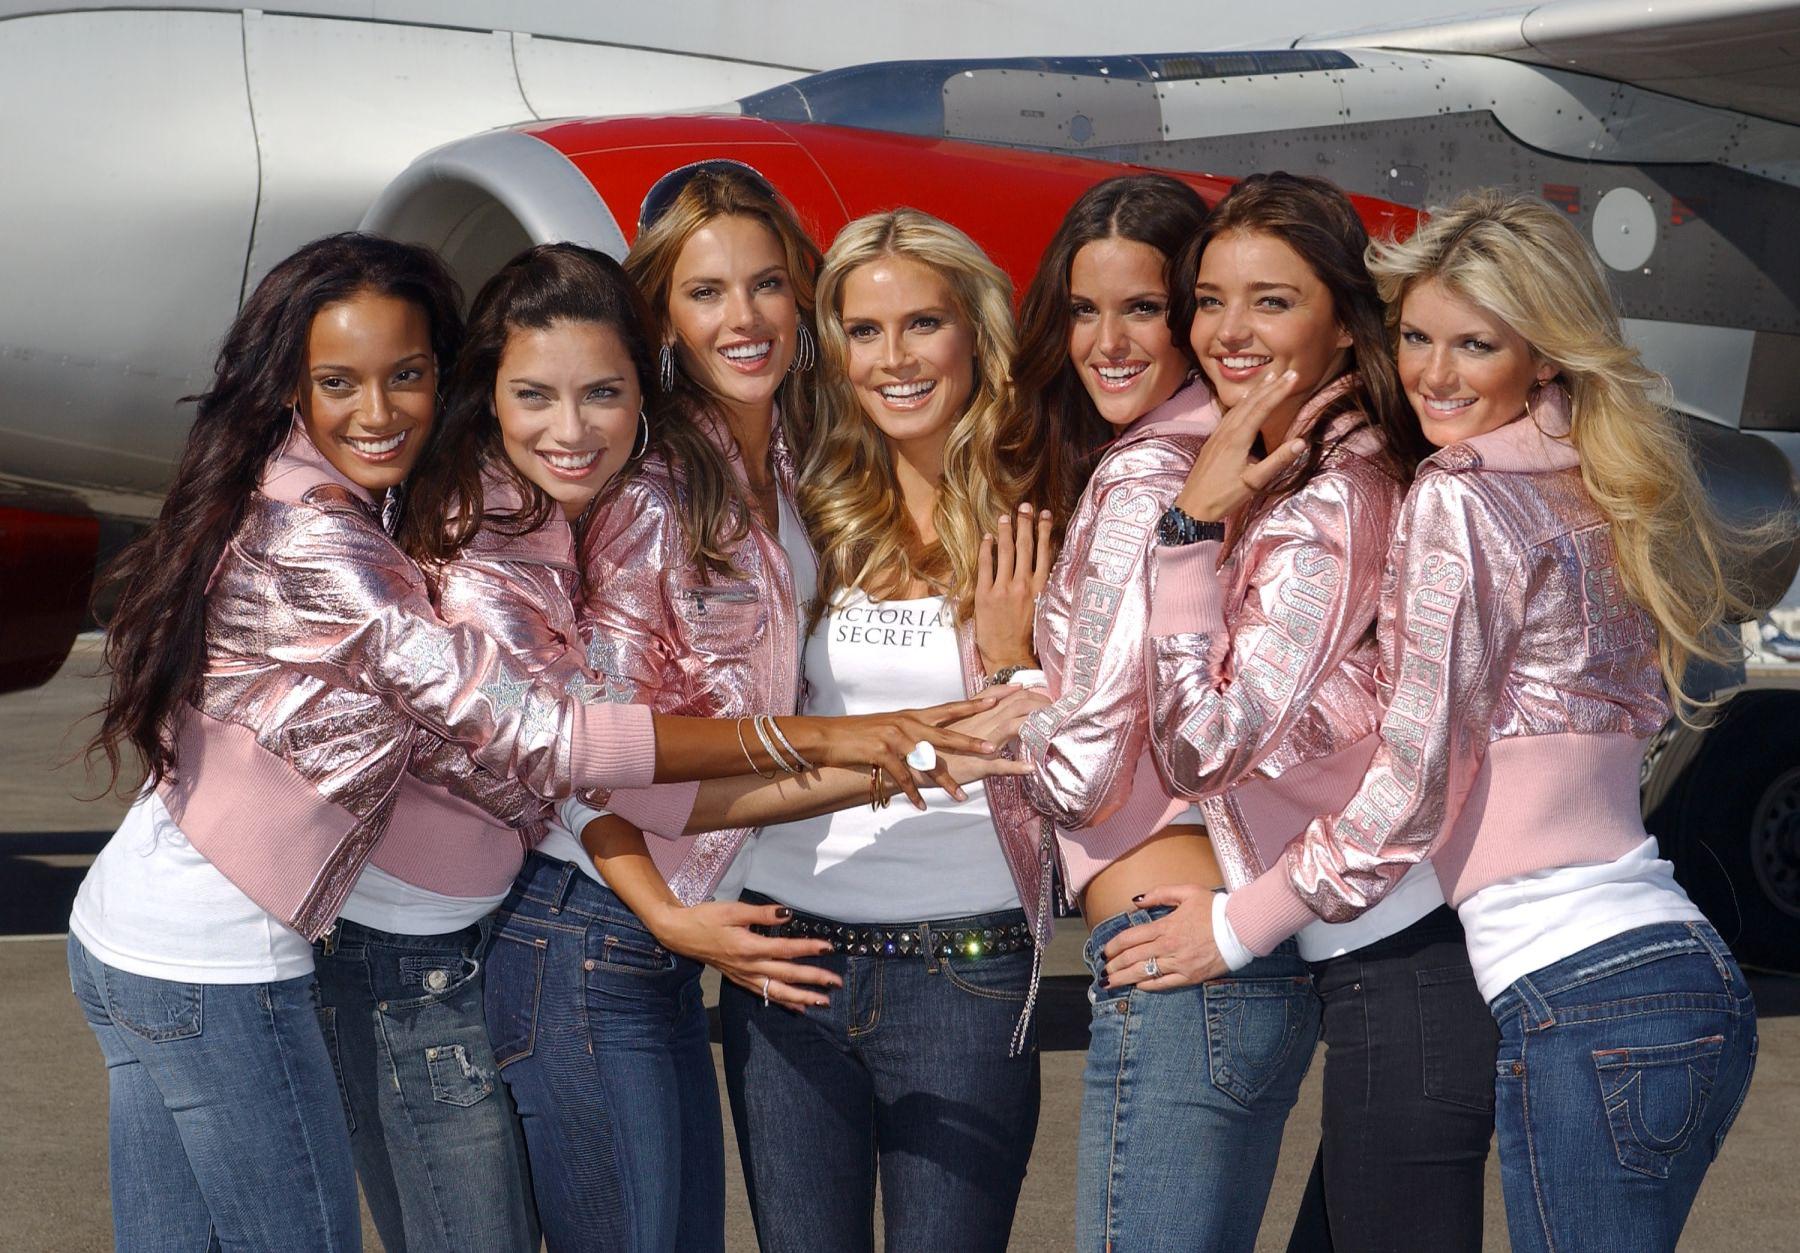 Heidi Klum dice adiós a Victoria's secret